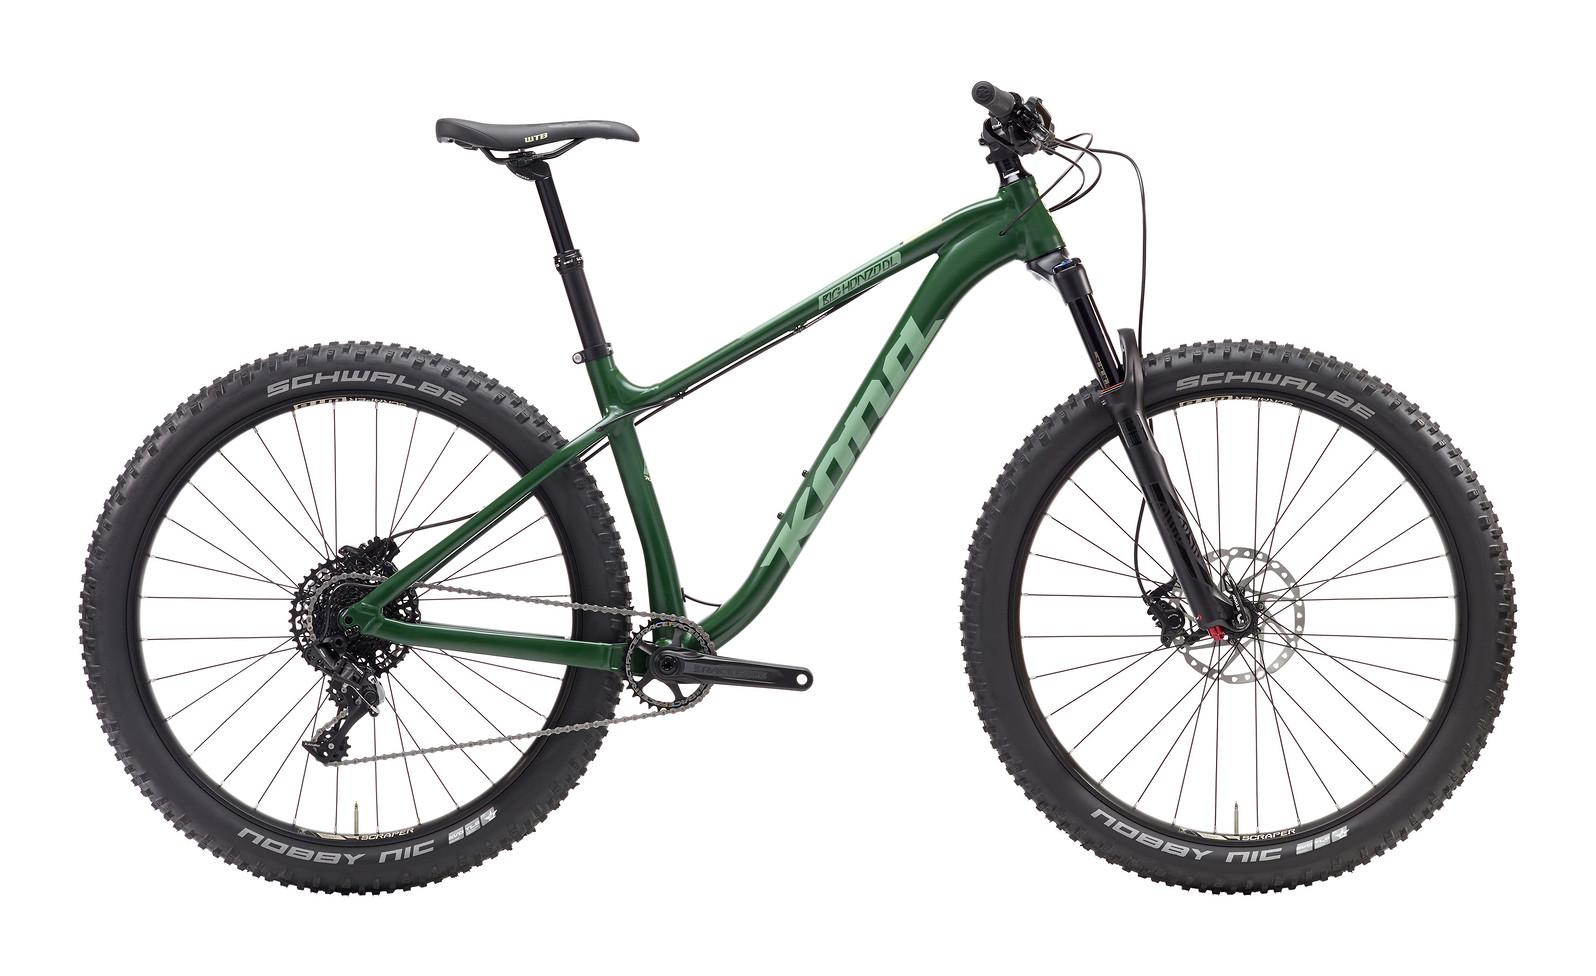 2017 Kona Big Honzo DL Bike